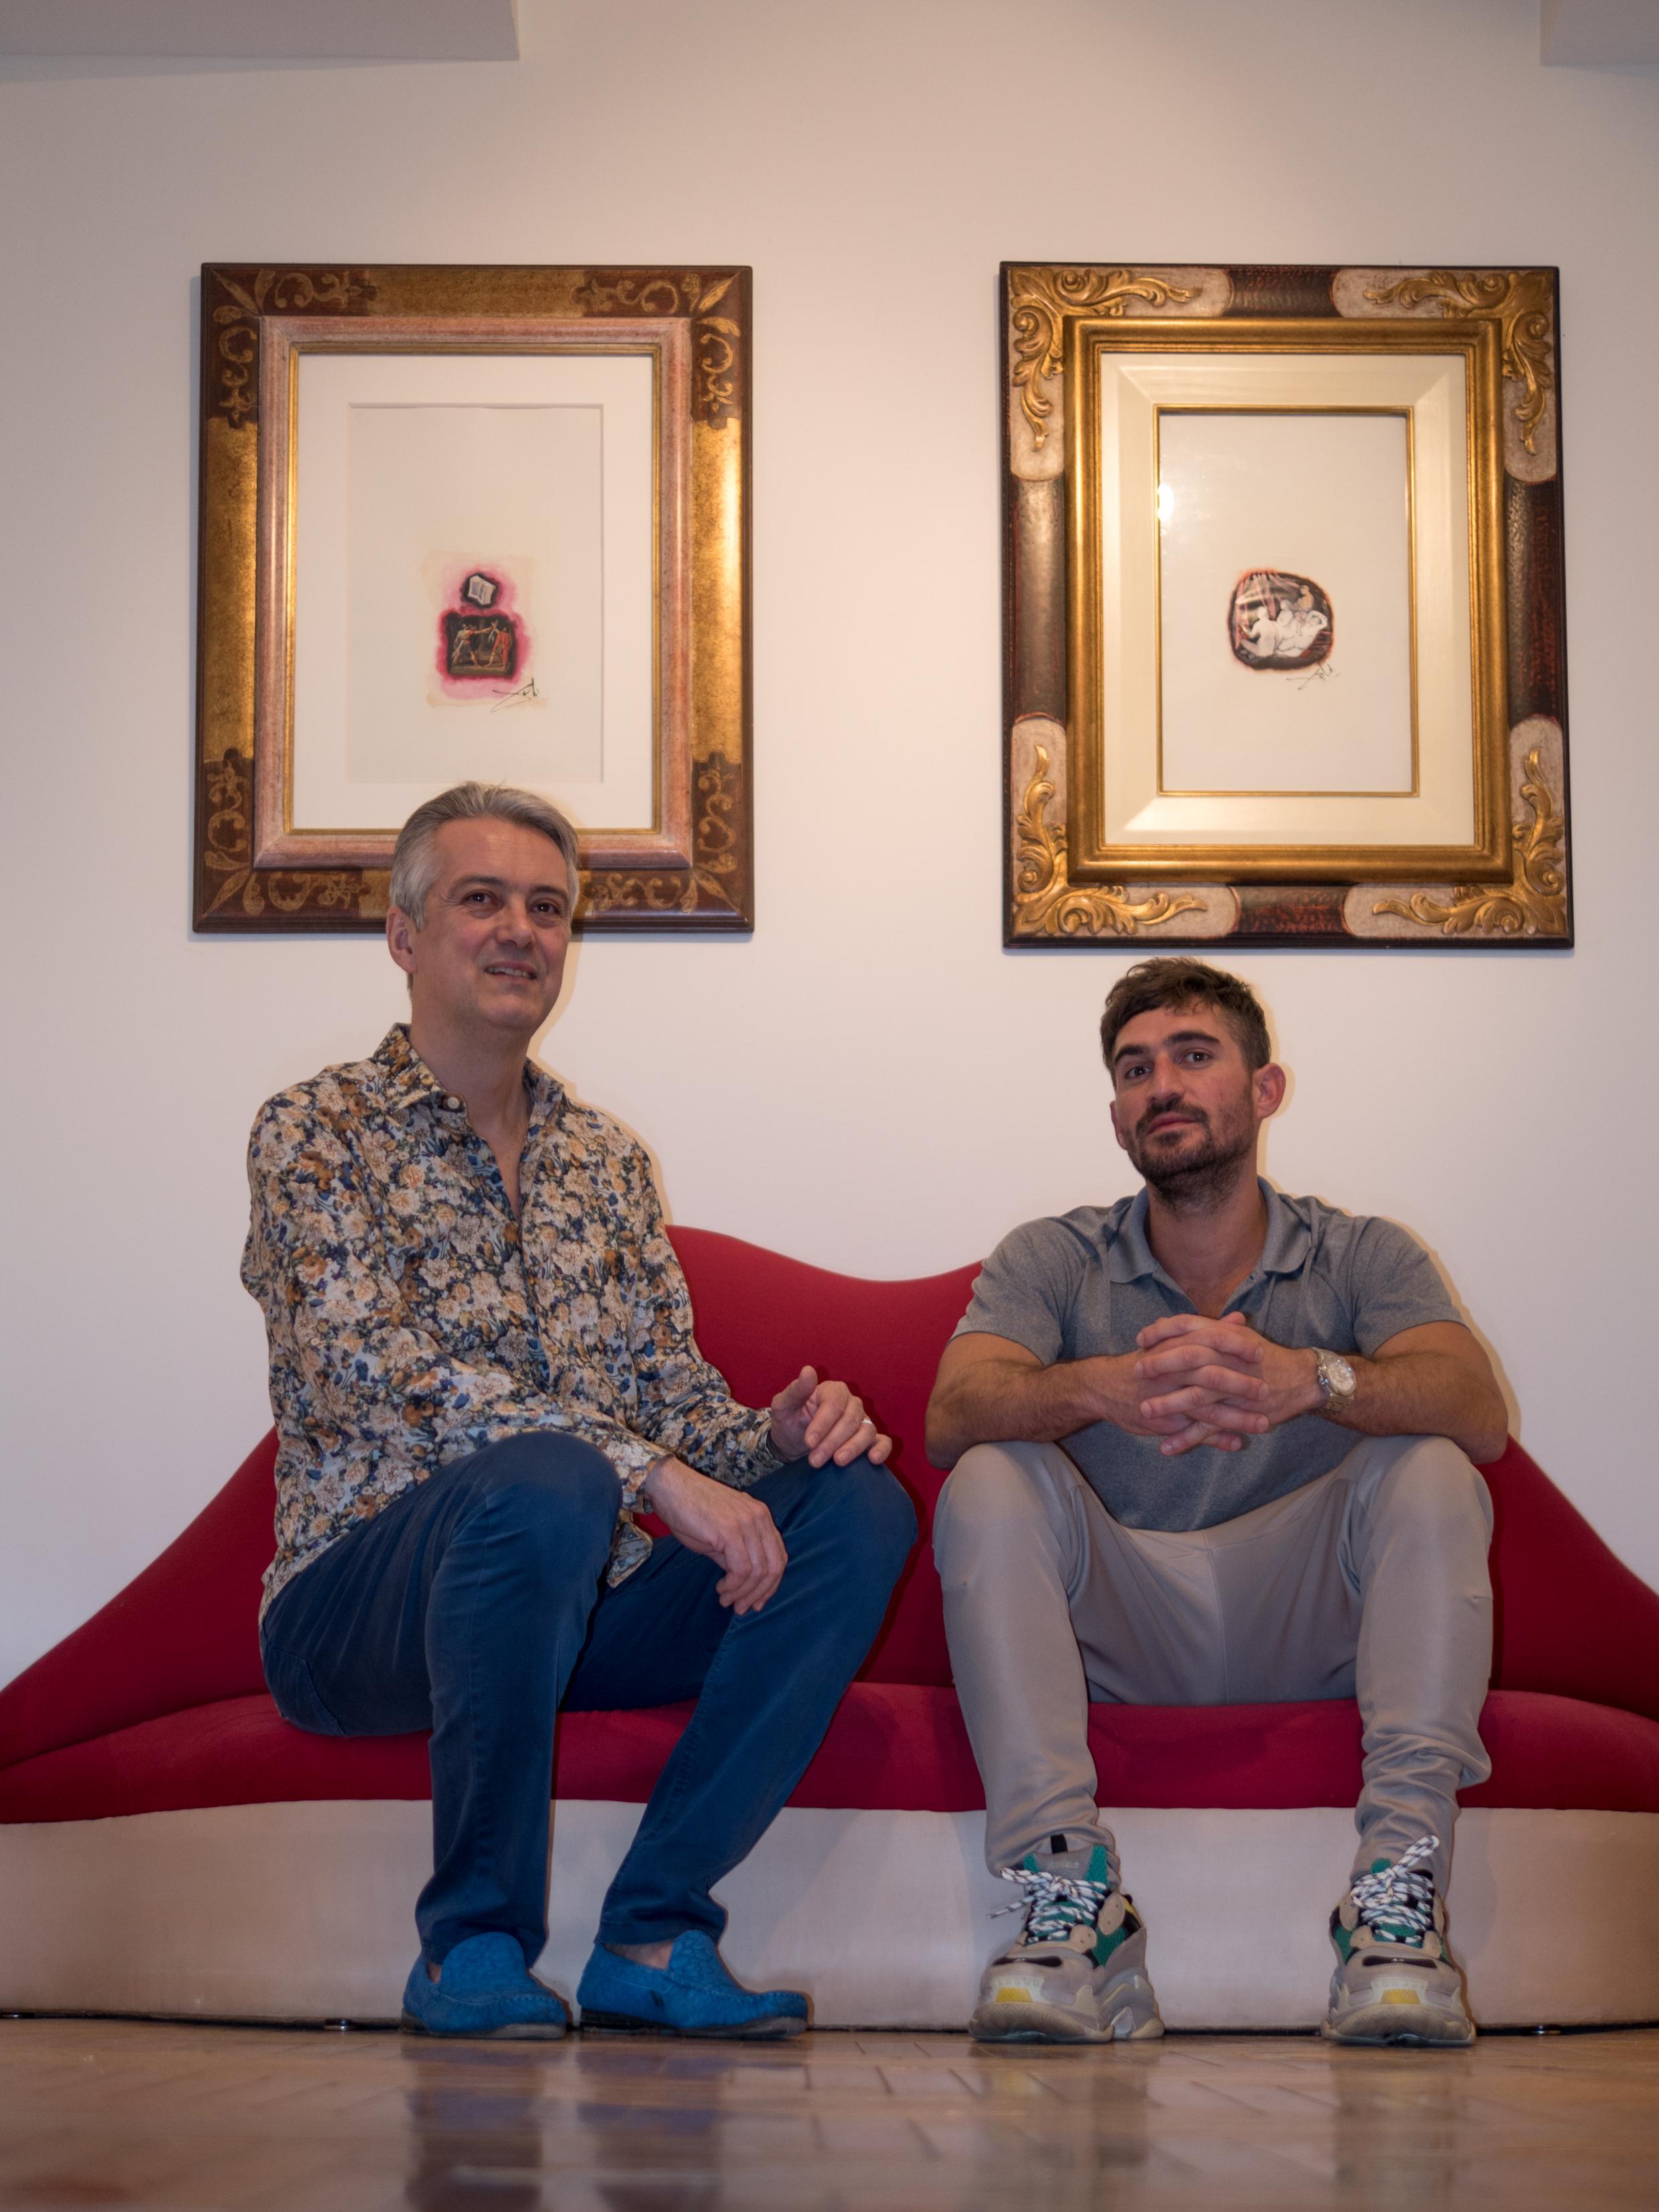 Marcel Katz with Bertrand Epaud of the Dali Universe. Photo by Peter Koliaff.